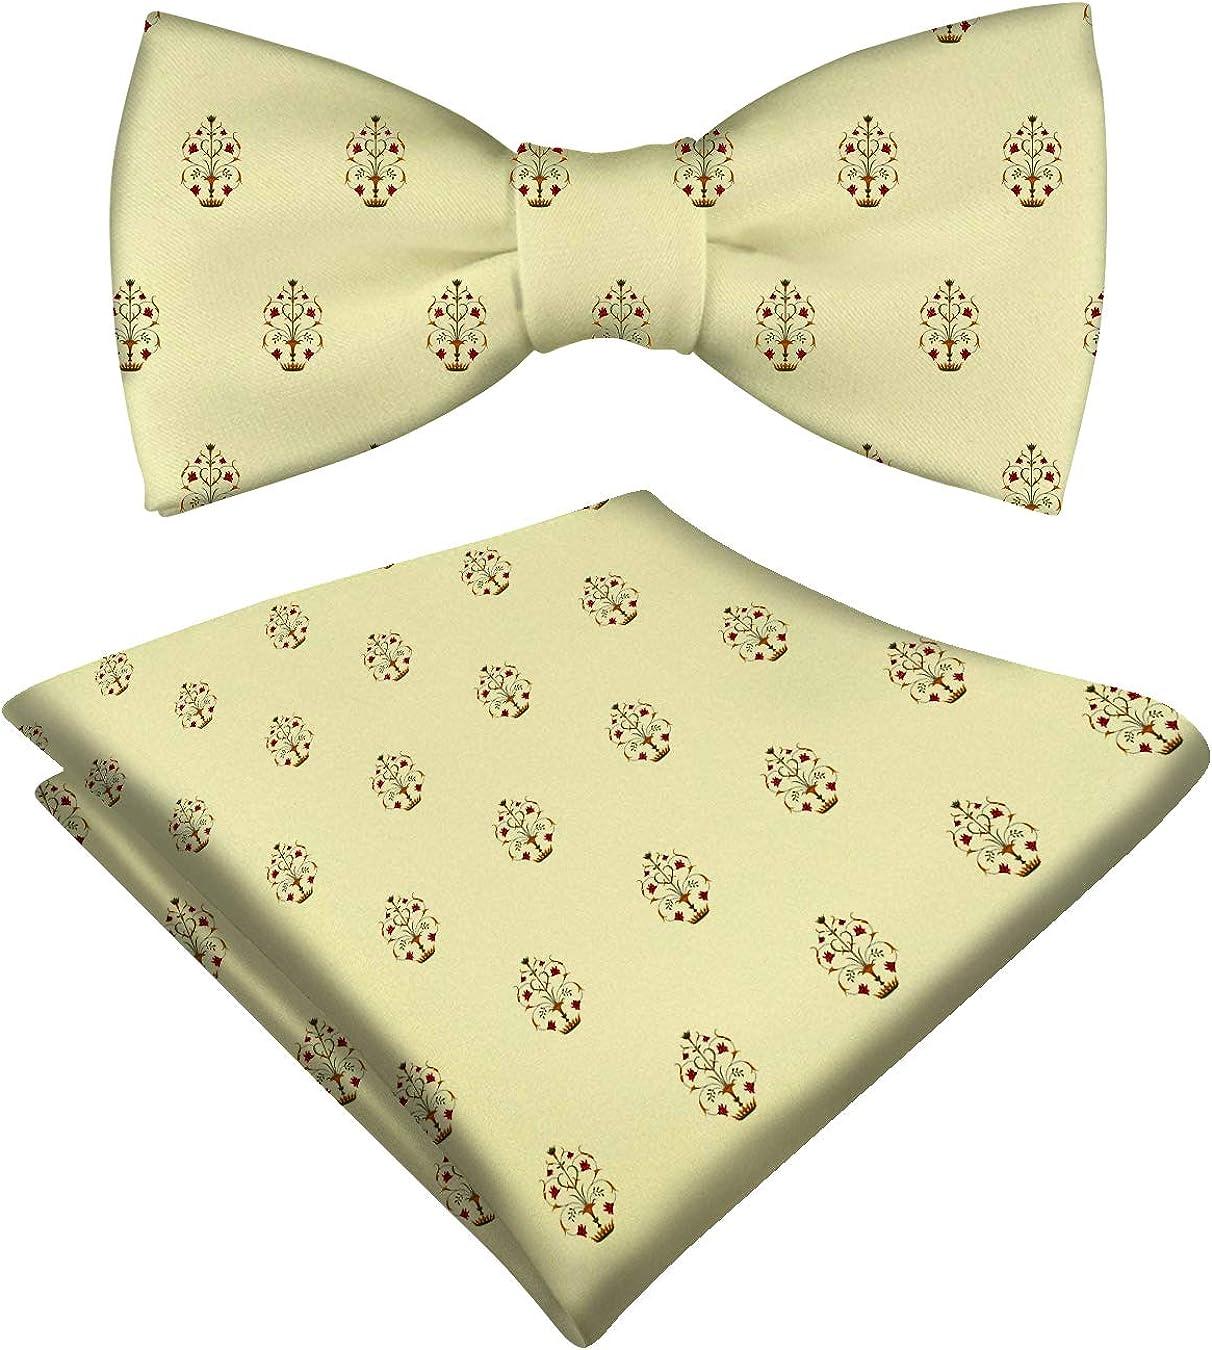 RADANYA Mens Pre-tied Bow Tie And Pocket Square Floral Printed Satin